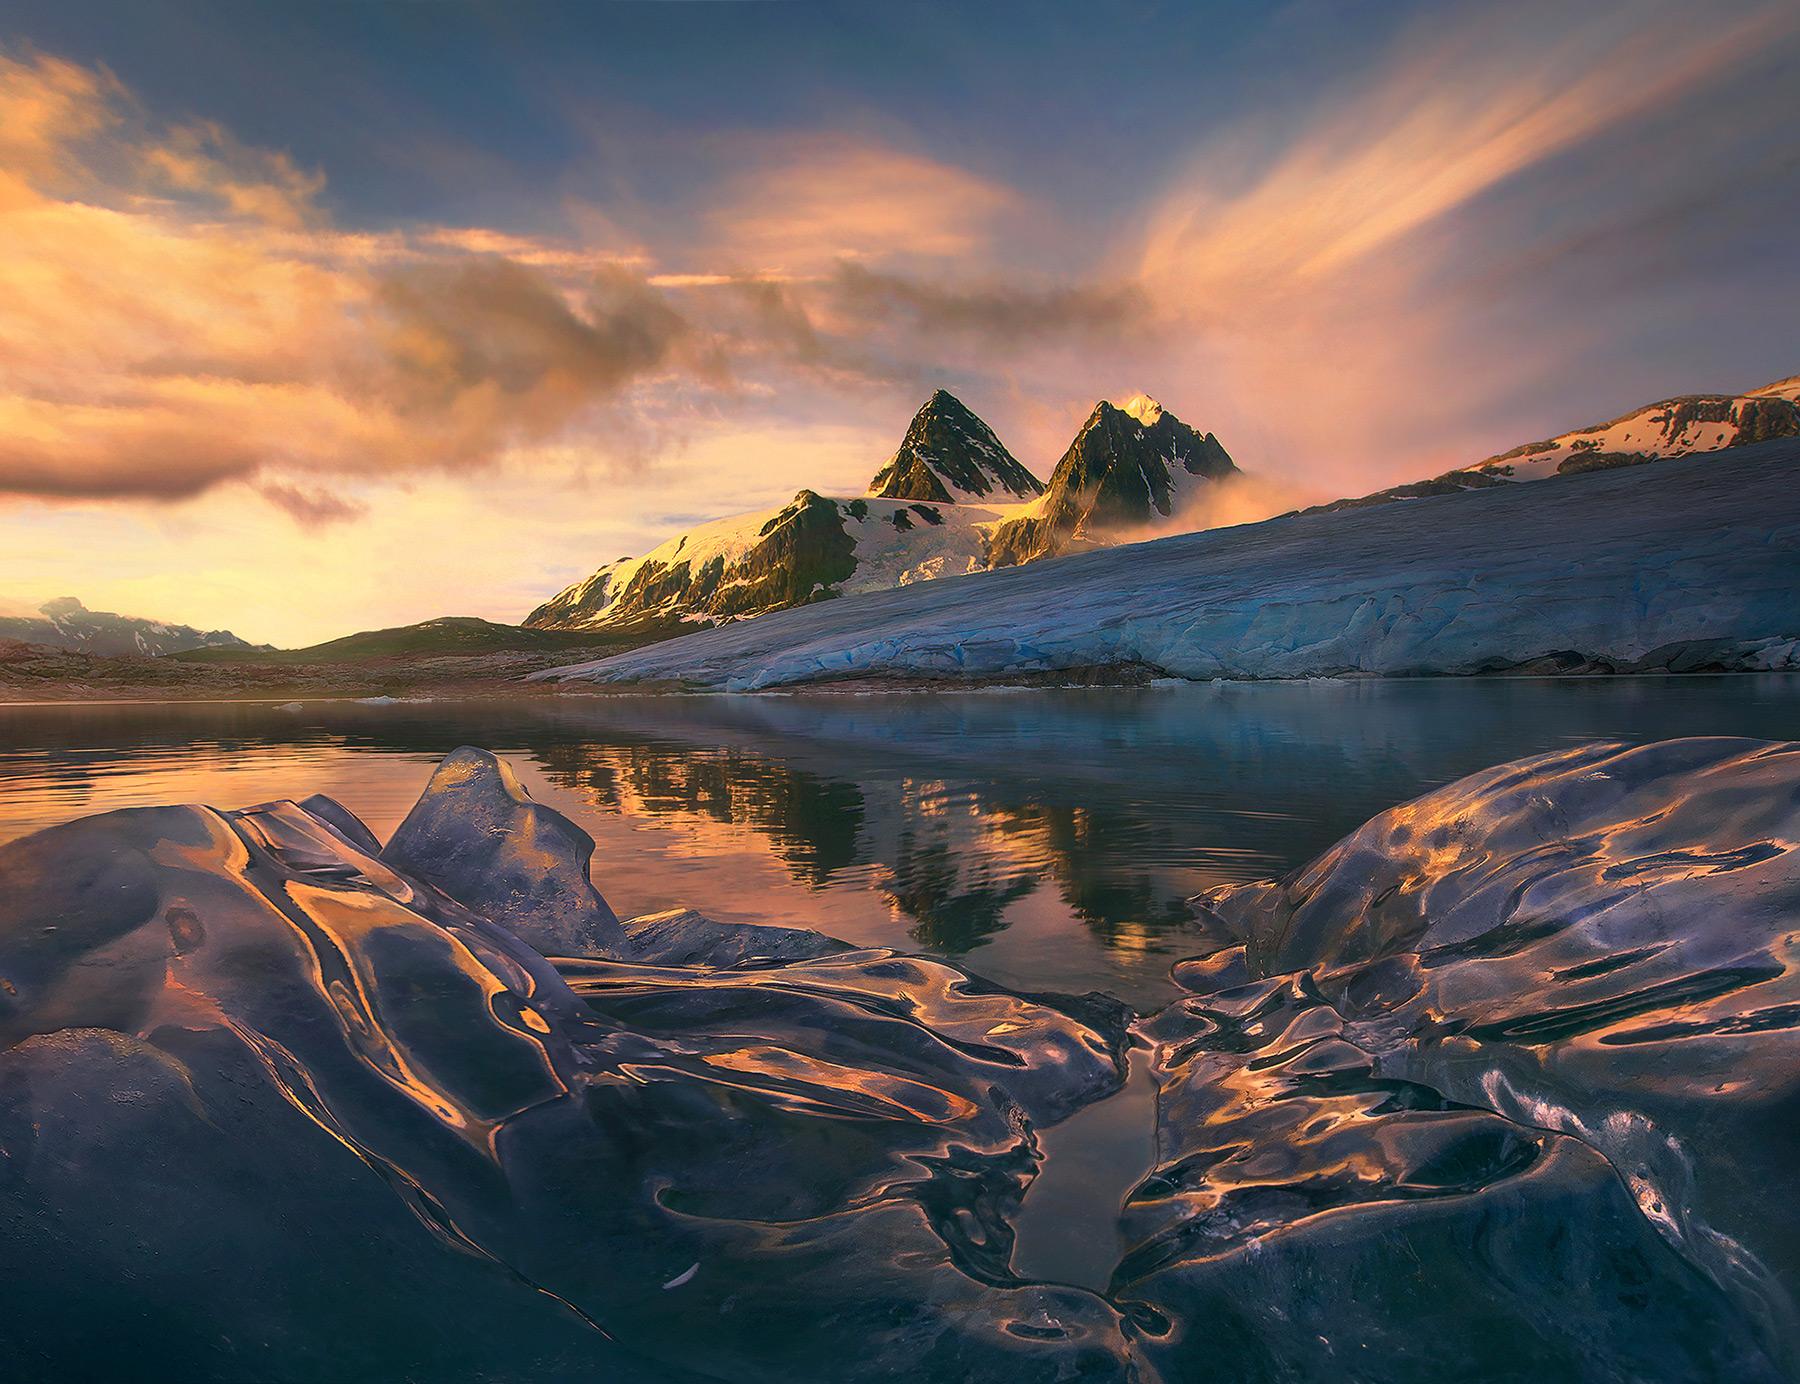 iceberg, reflection, coast mountains, bc, alaska, photo